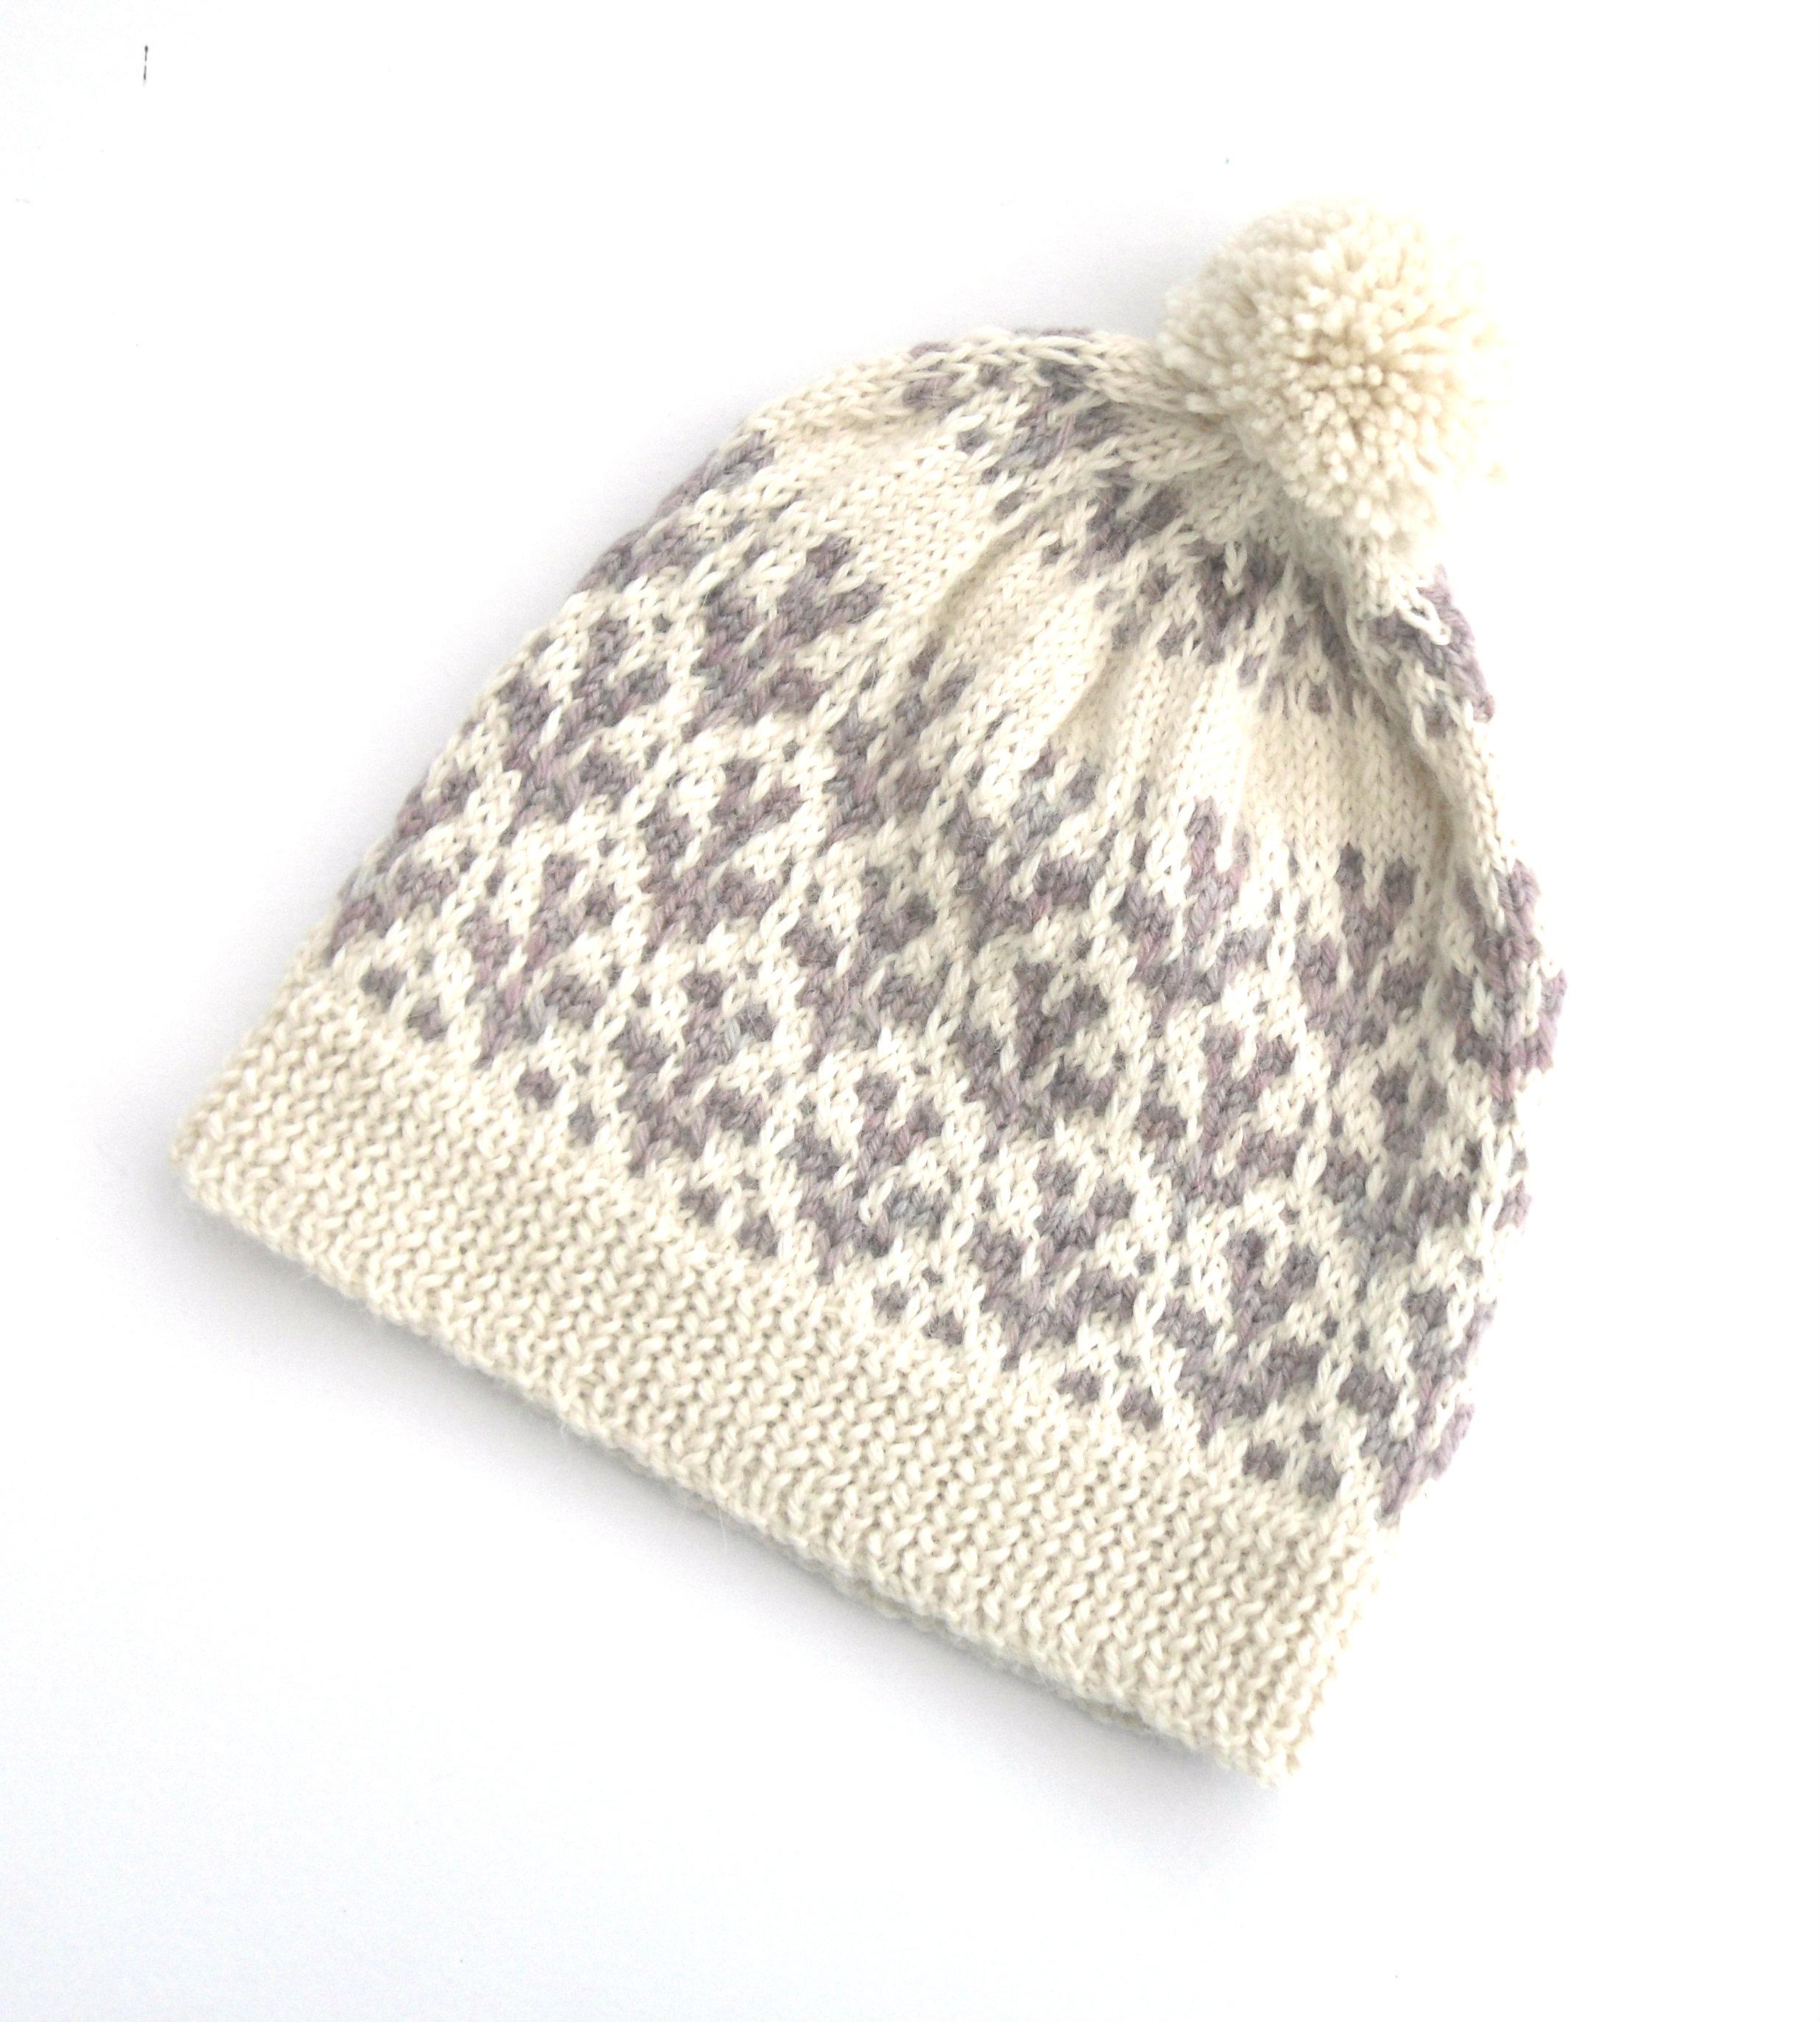 Knitting Kits Uk : Sprig beanie hat knit kit with baa brew